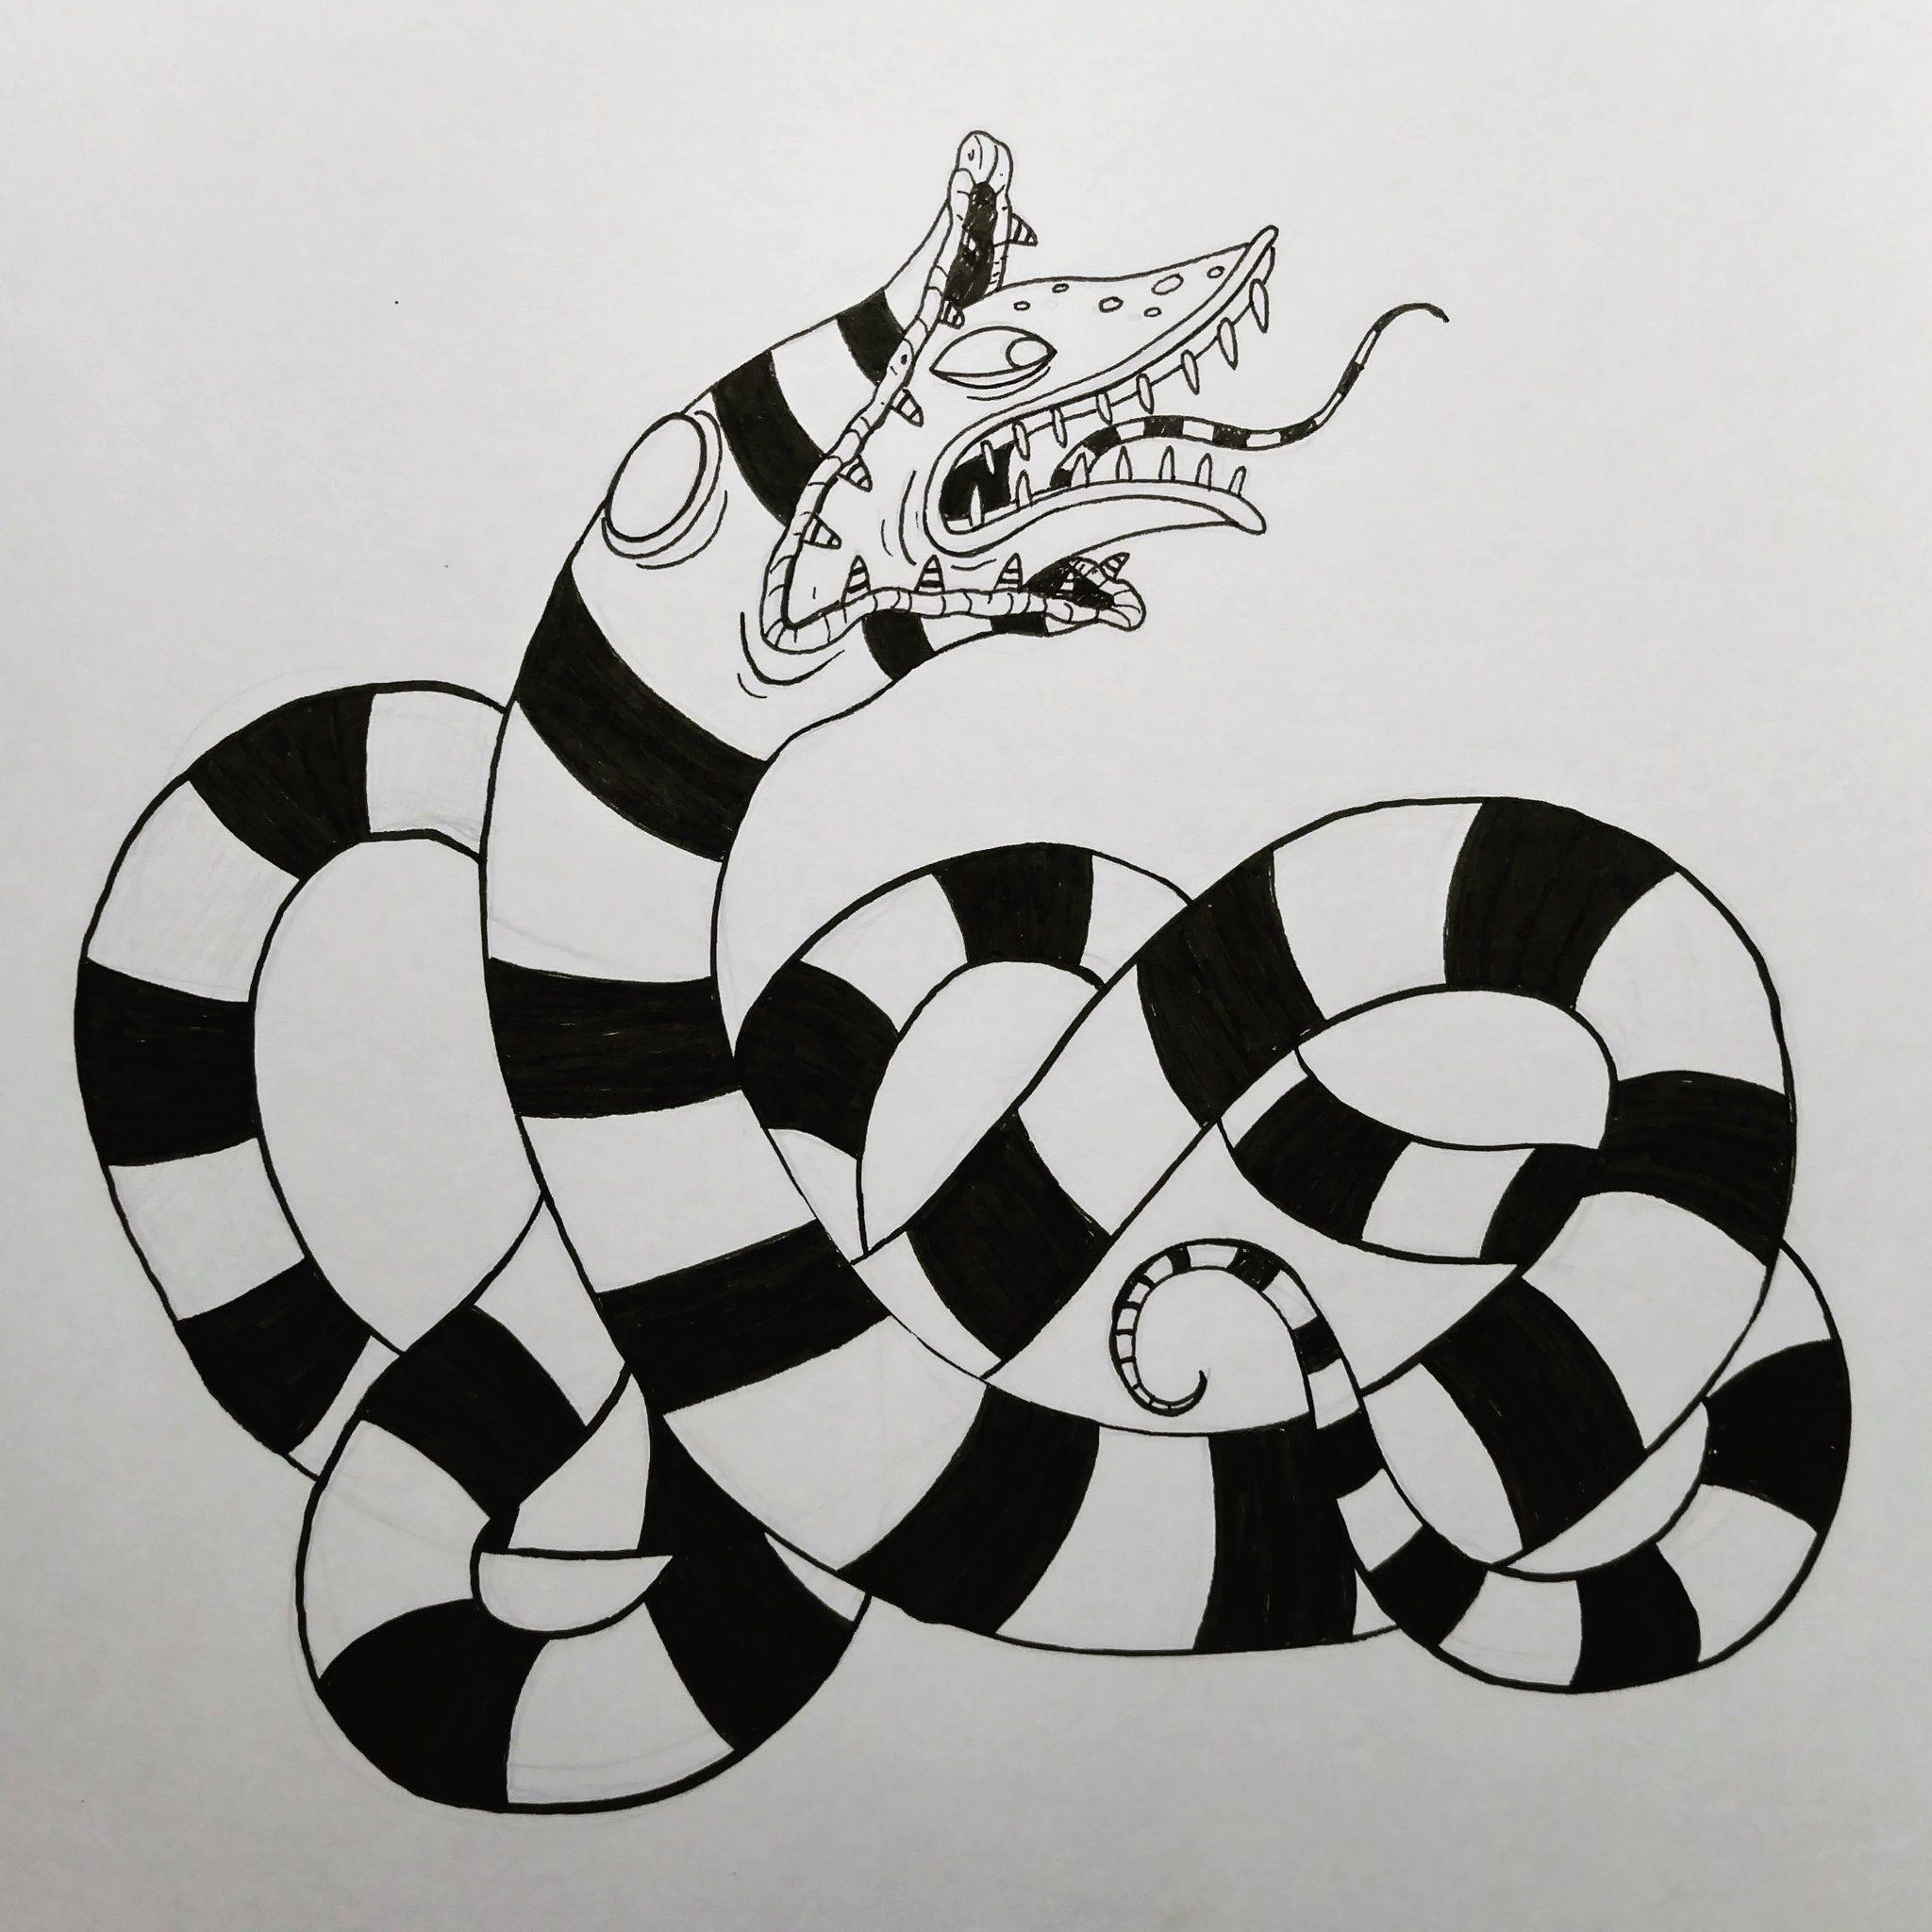 Pin By Sophie Pearce On Drawing Beetlejuice Tattoo Tim Burton Art Halloween Tattoos